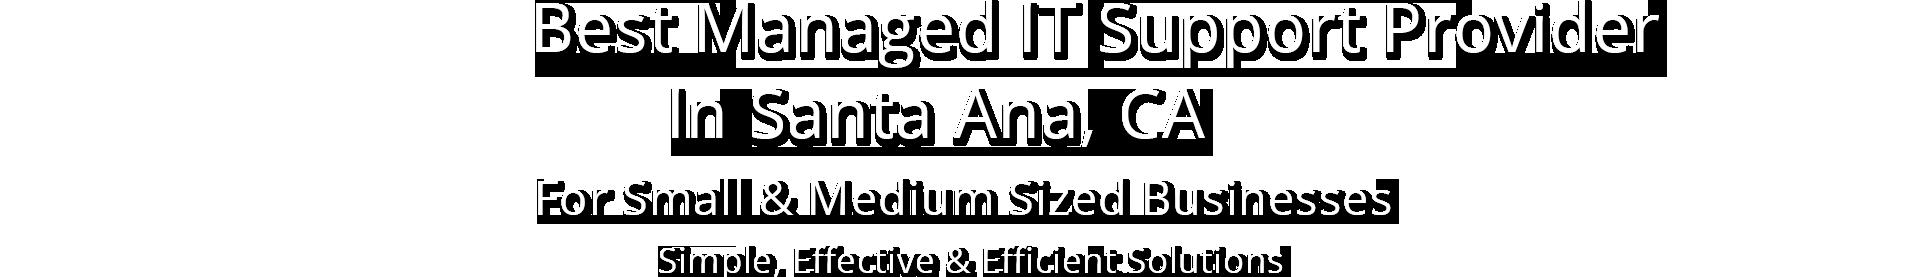 Santa Ana IT Support